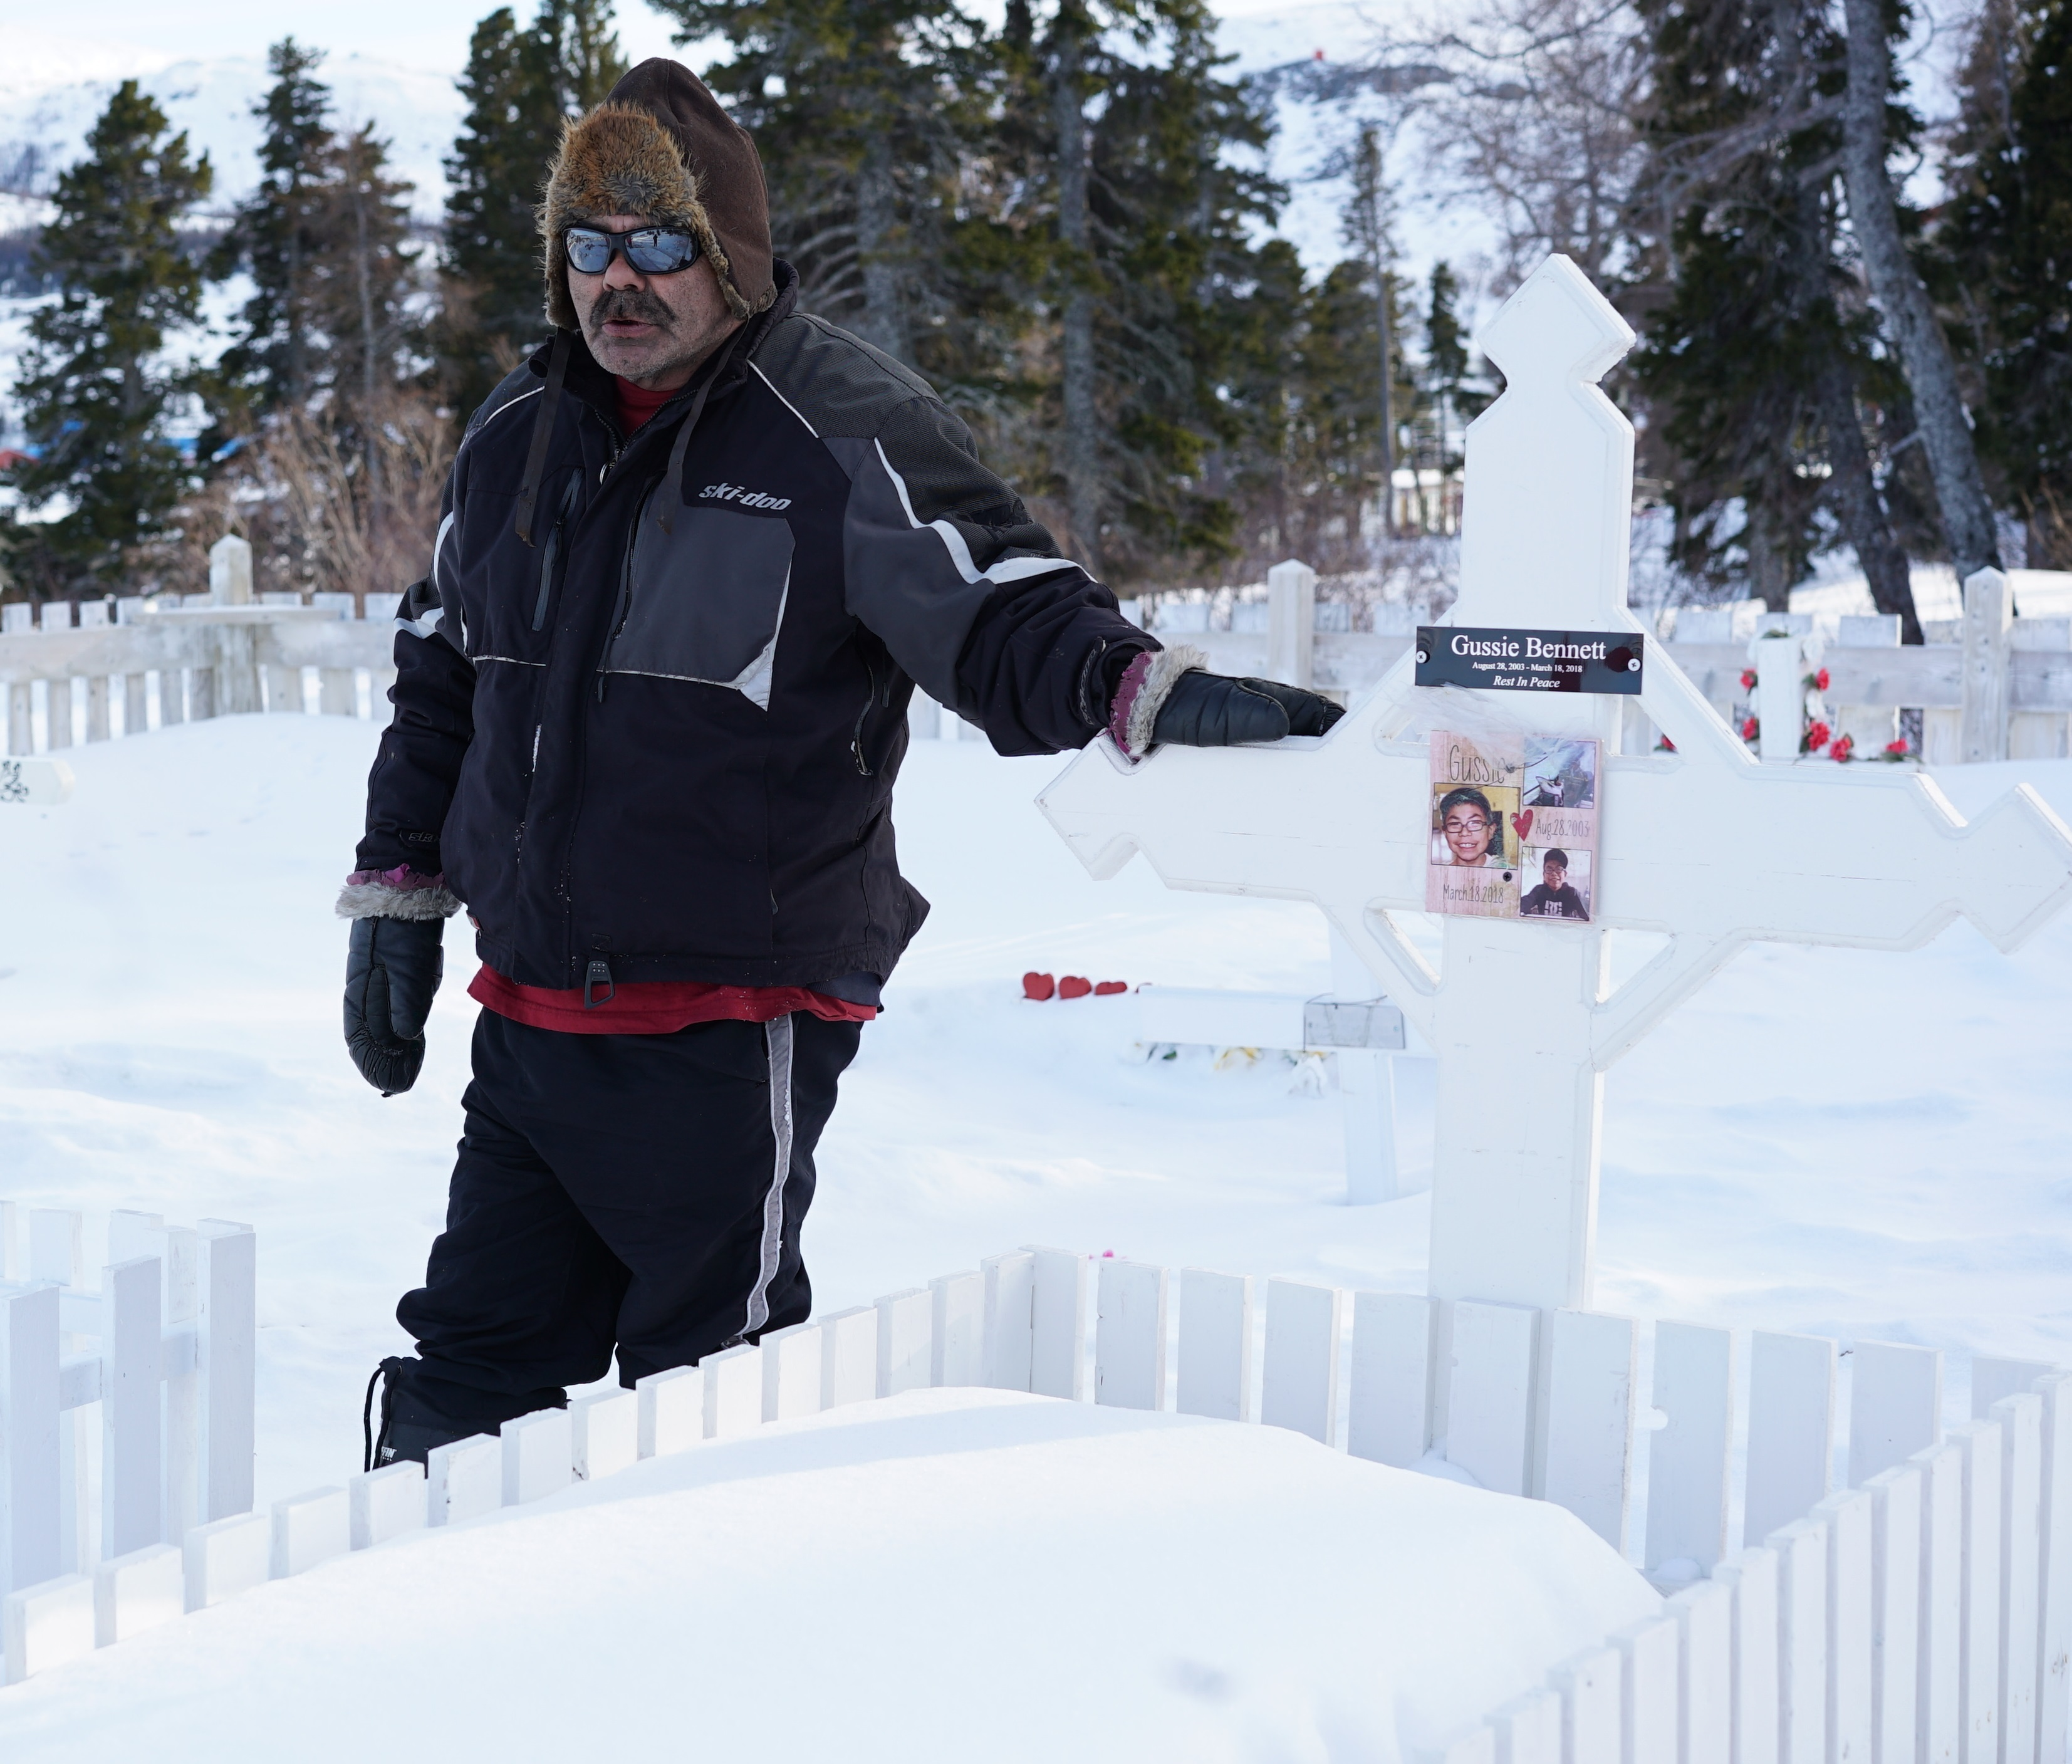 Jim Bennett at his son's grave. (Ossie Michelin/CBC)